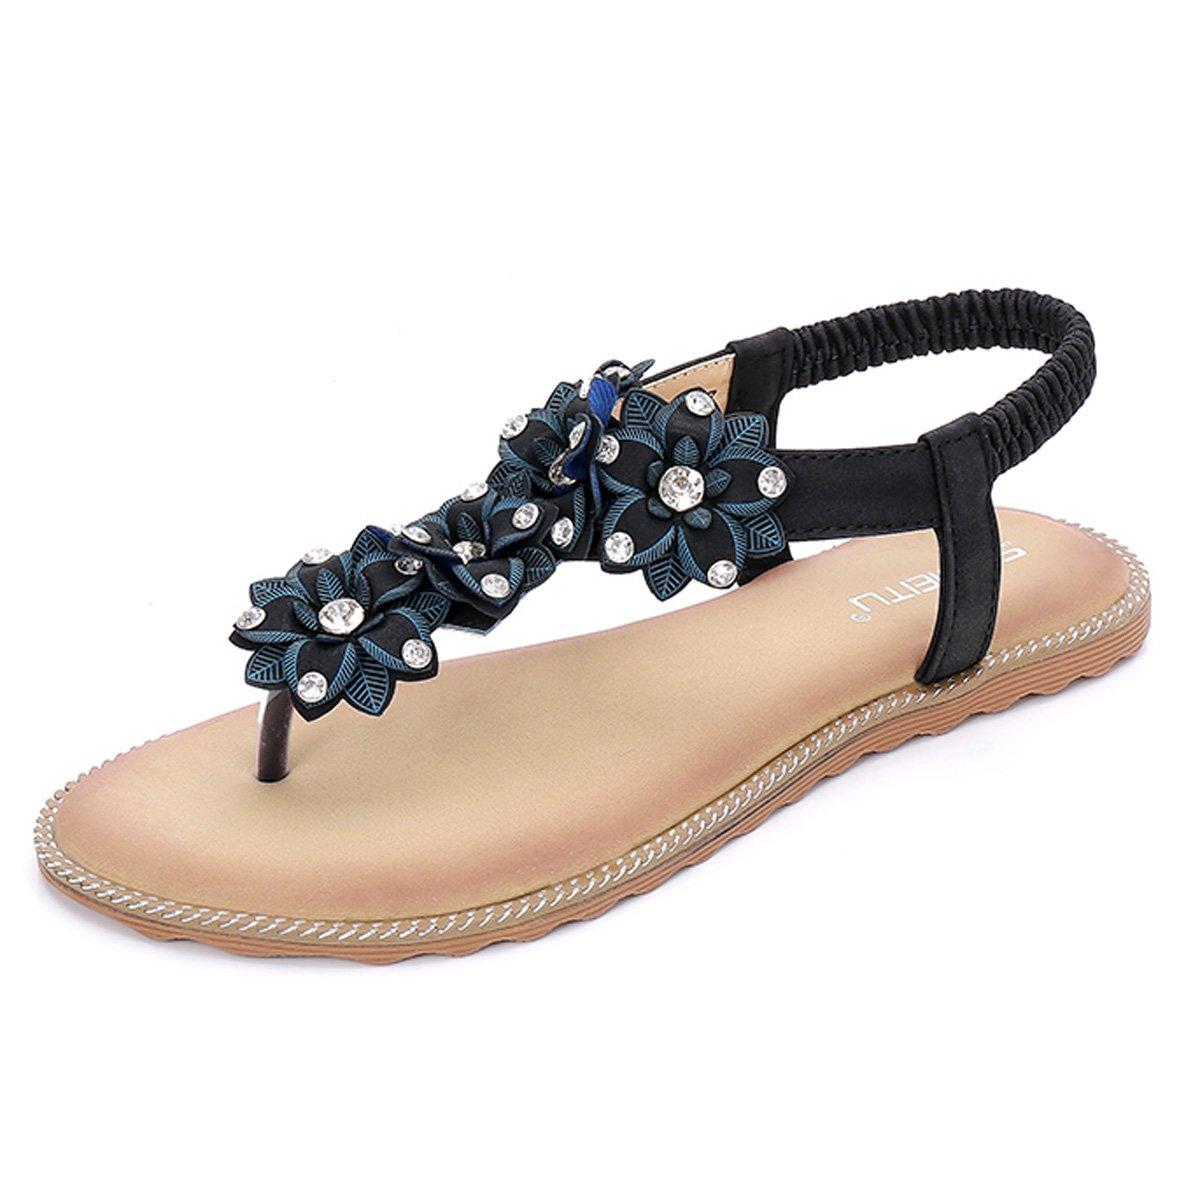 gracosy Damen Sandalen, Flip Flops Sommer Sandals Flach Zehentrenner T-Strap Offen Bouml;hmische Strand Schuhe  37 EU|Schwarz-b